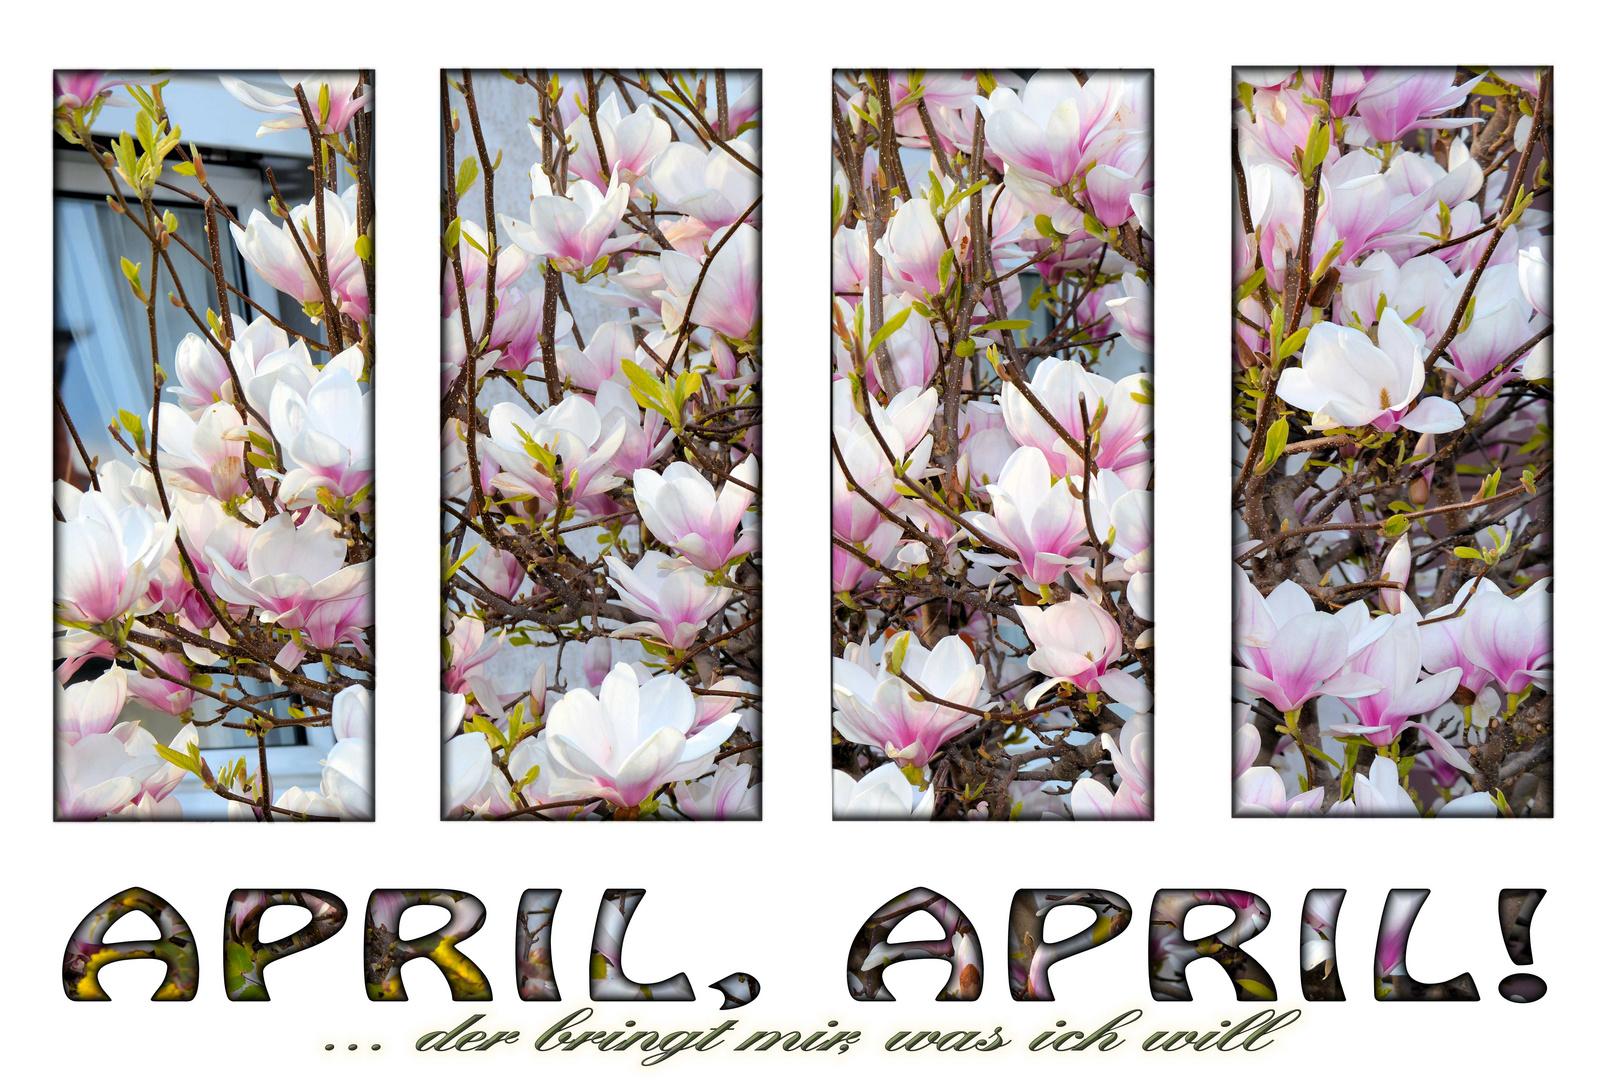 April, April der bringt mir, was ich will